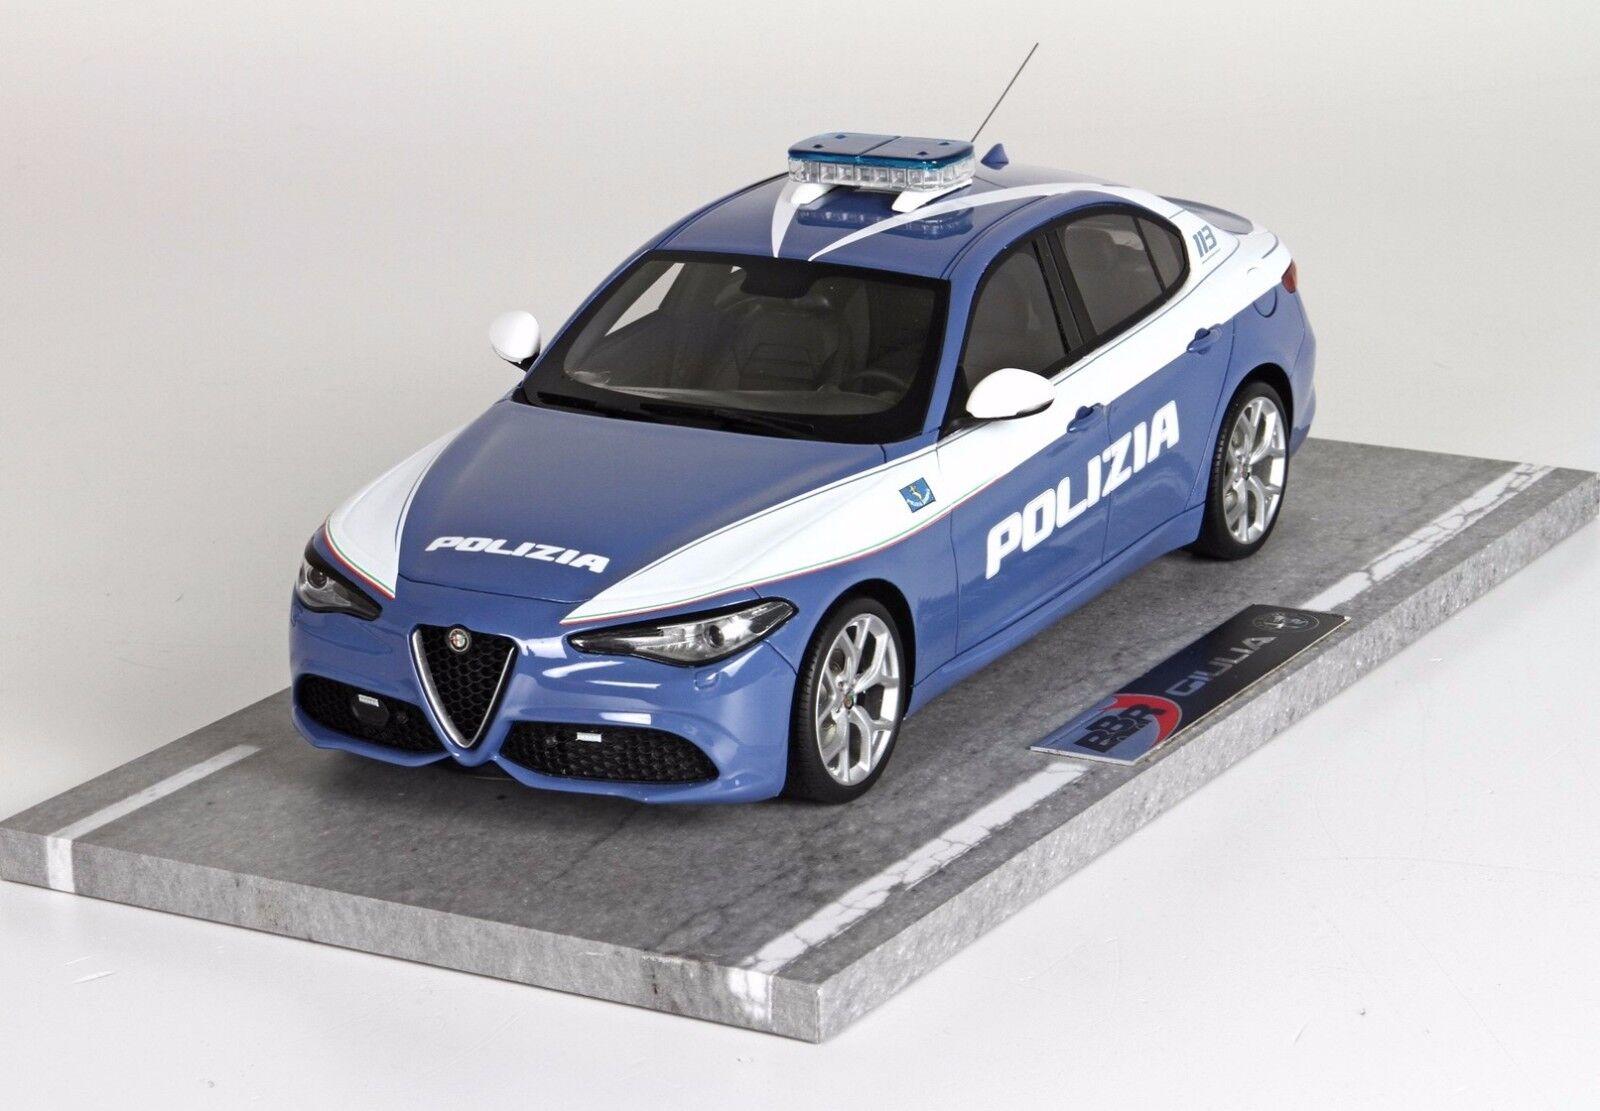 ¡no ser extrañado! Alfa Romeo Giulia Veloce Veloce Veloce  Versione Polizia 2016 1 18 scale BBRC1829POLI  compra en línea hoy